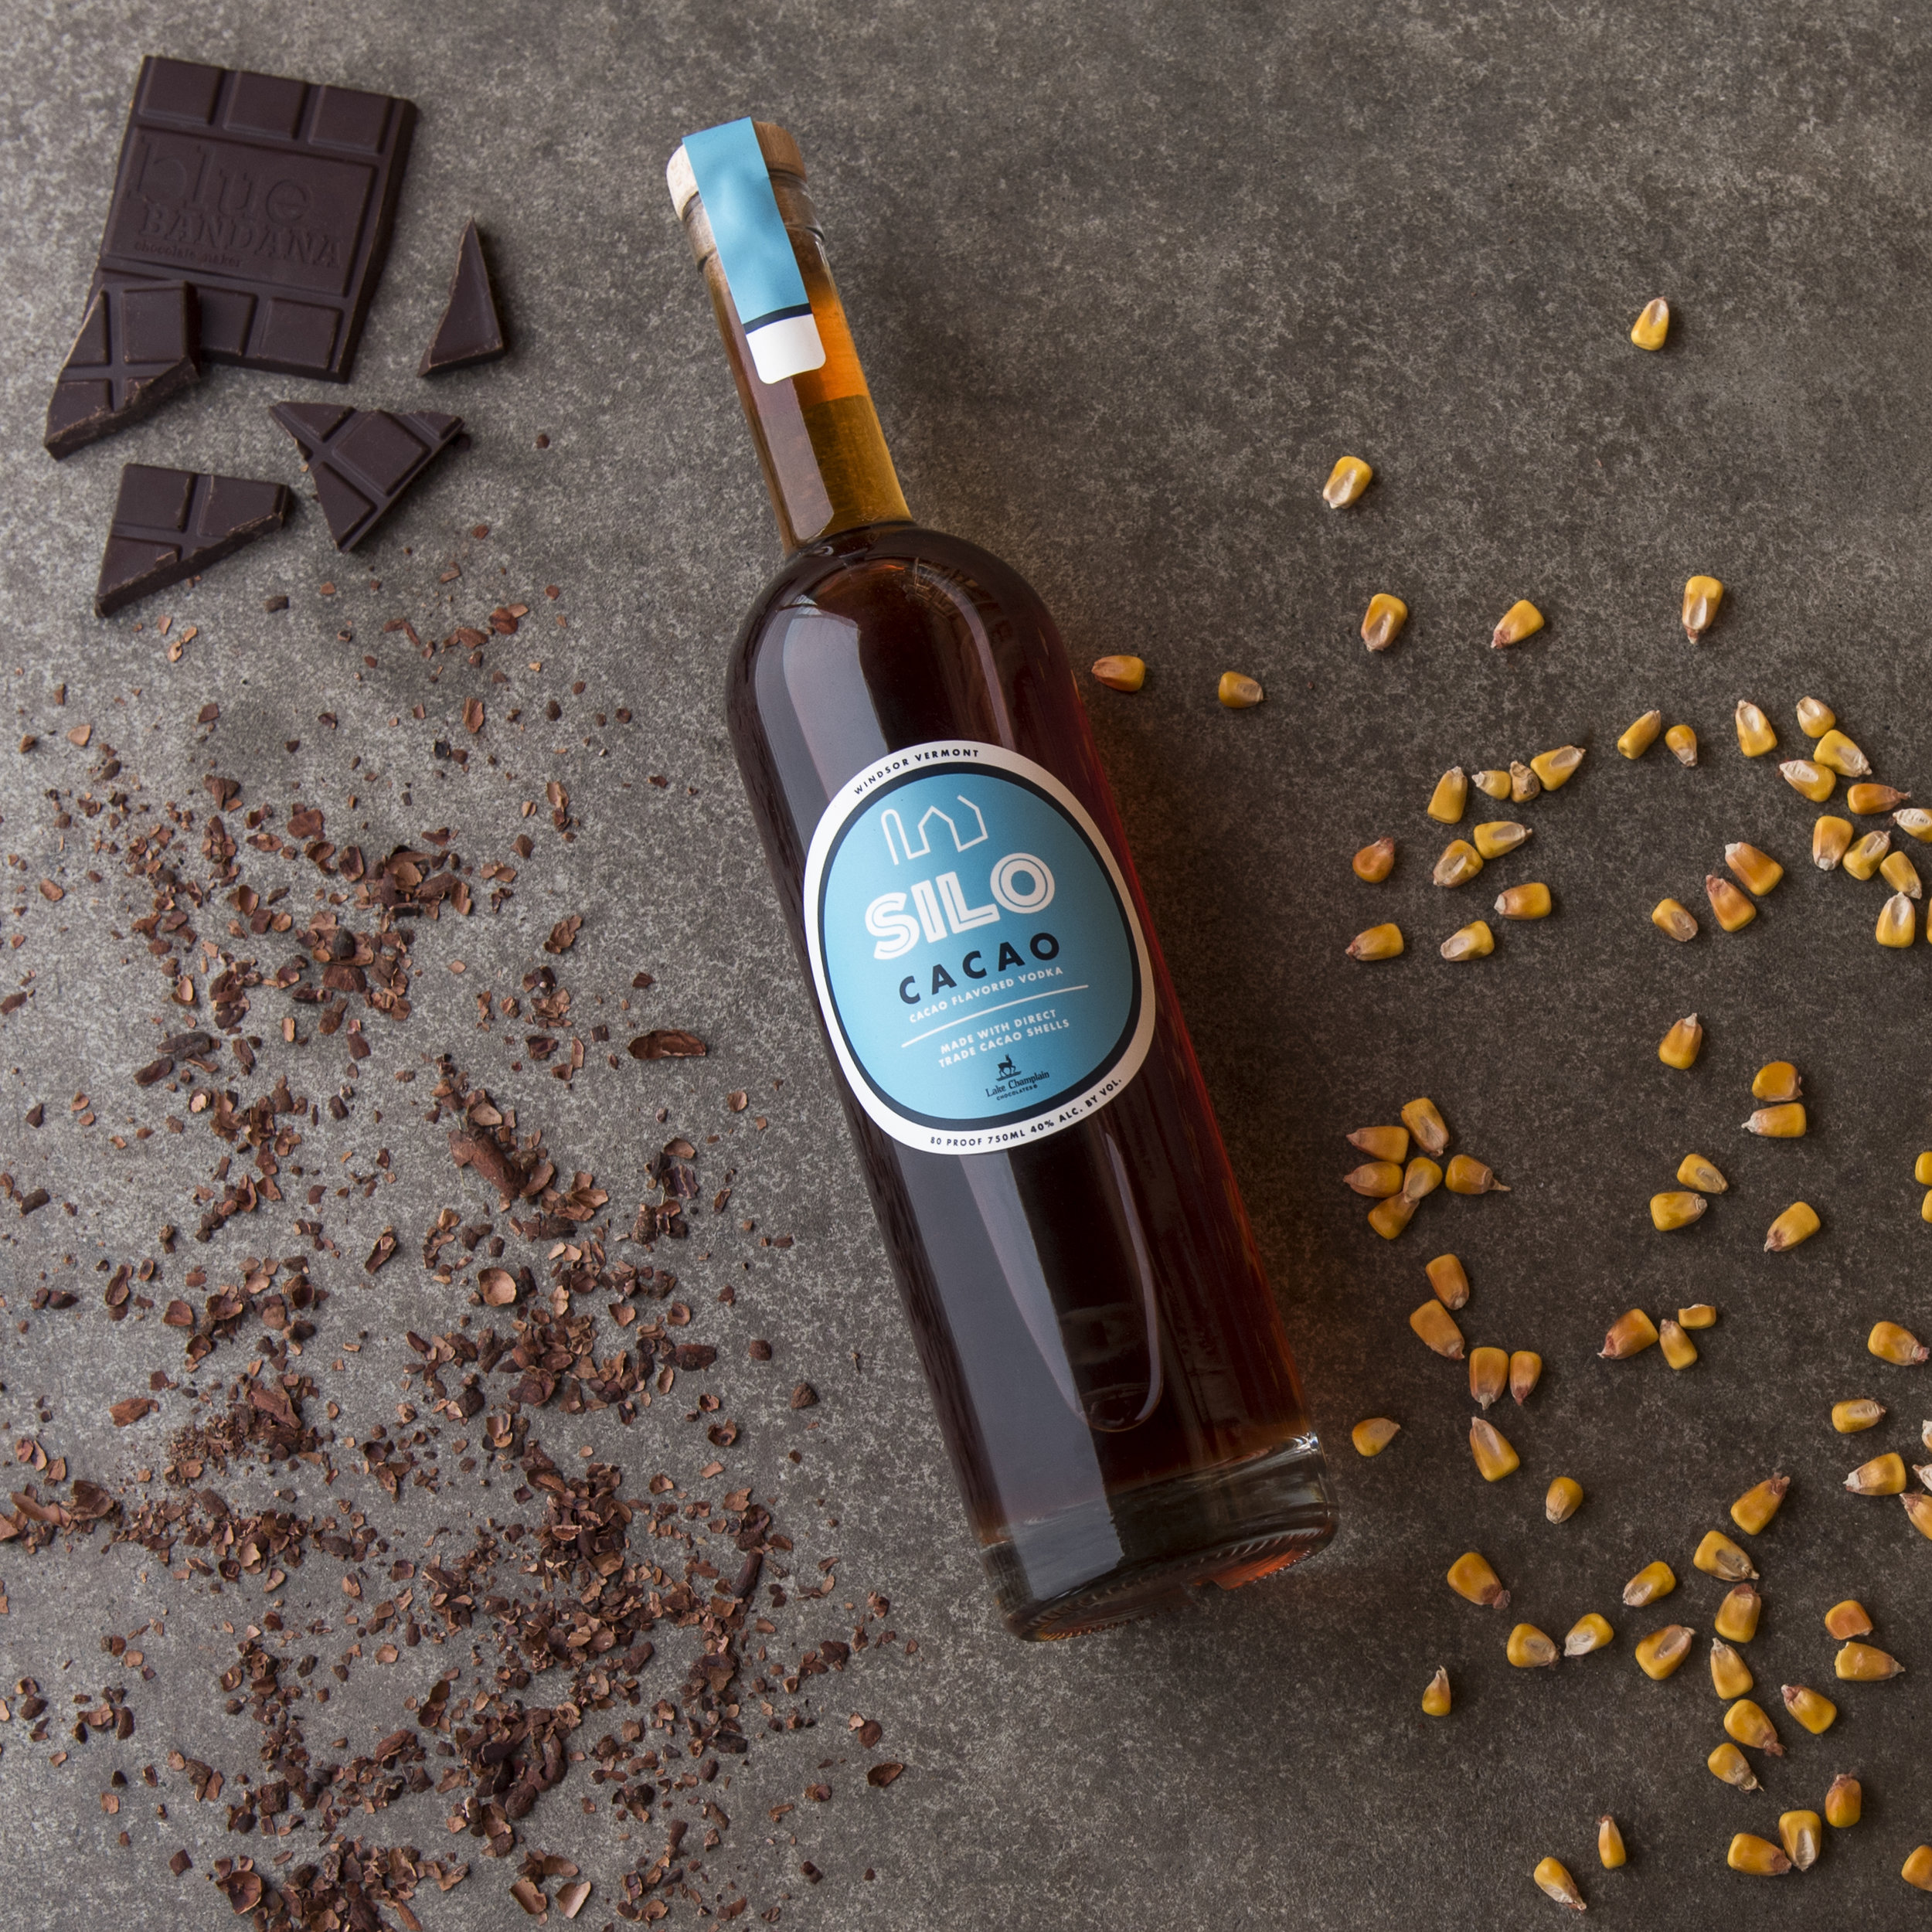 silo-cacao-vodka-1.jpg